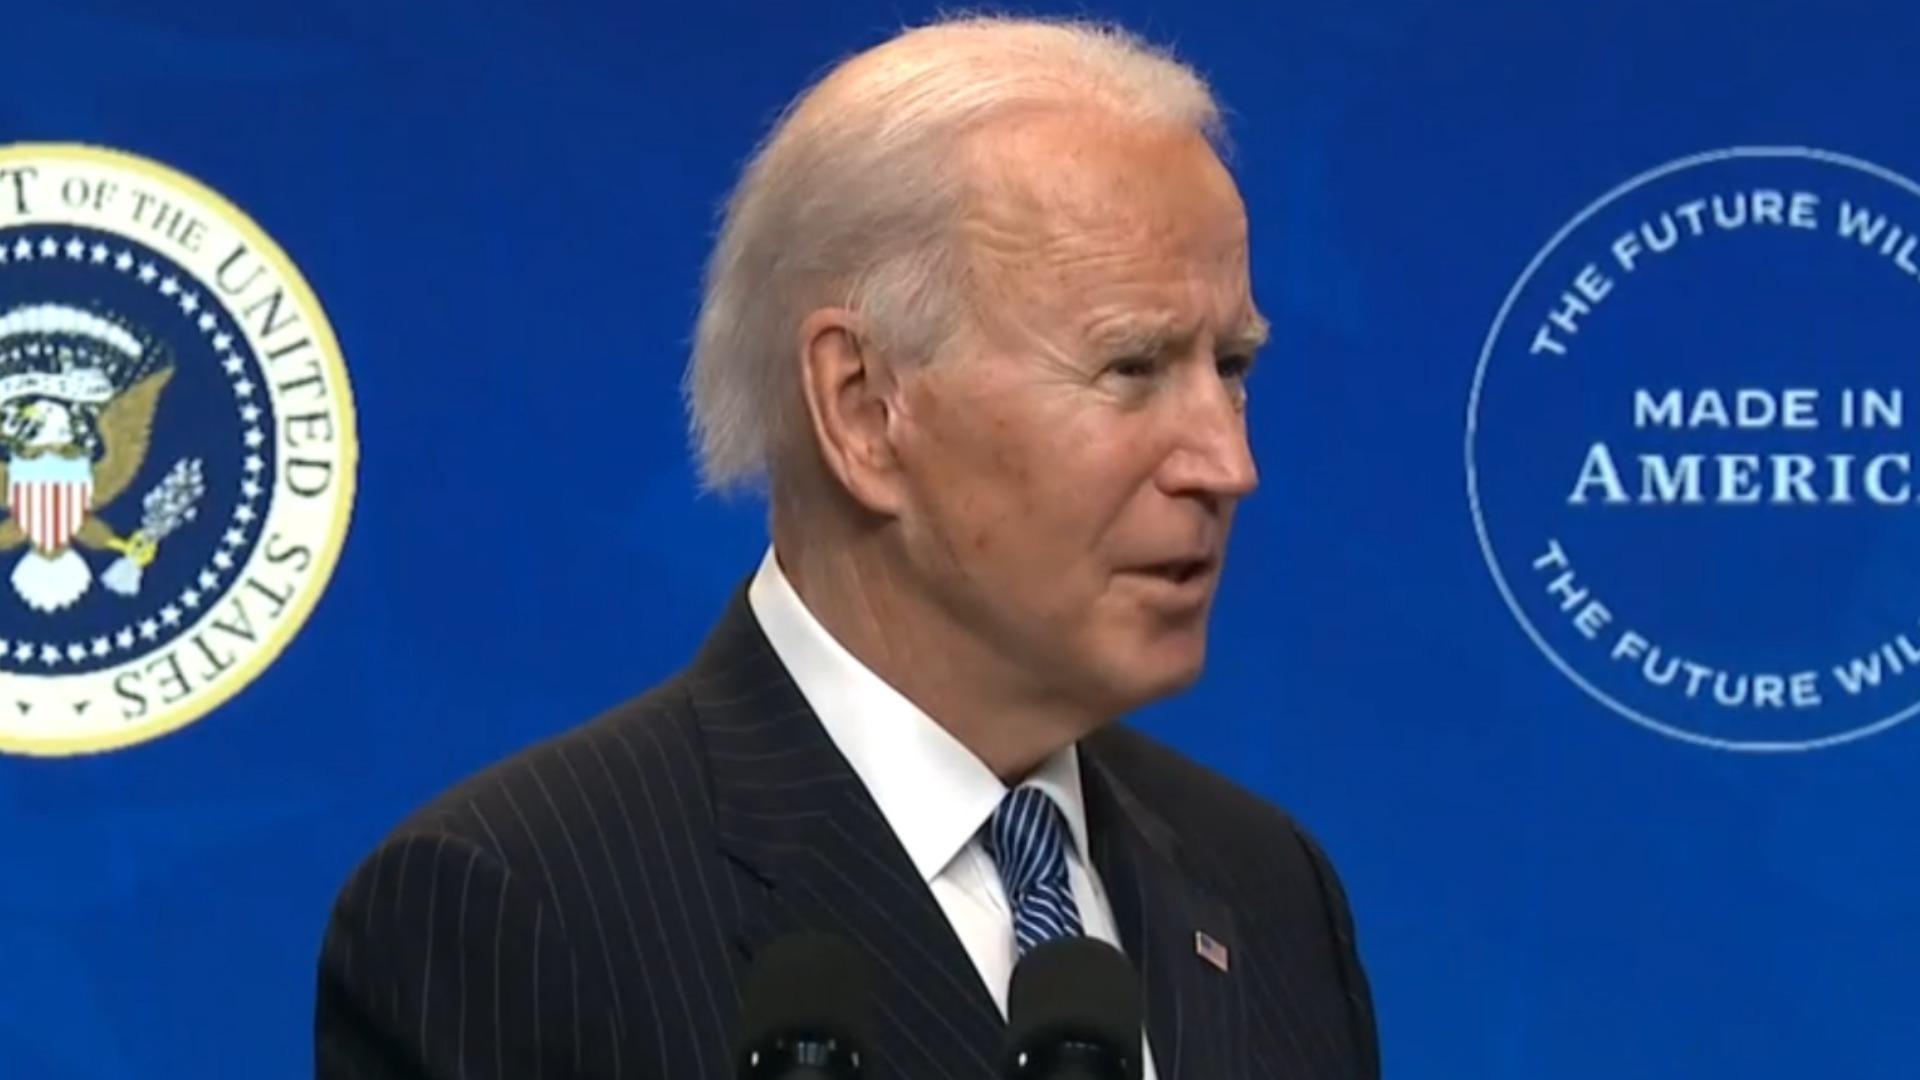 www.yahoo.com: Biden to address racism toward Asian Americans during pandemic